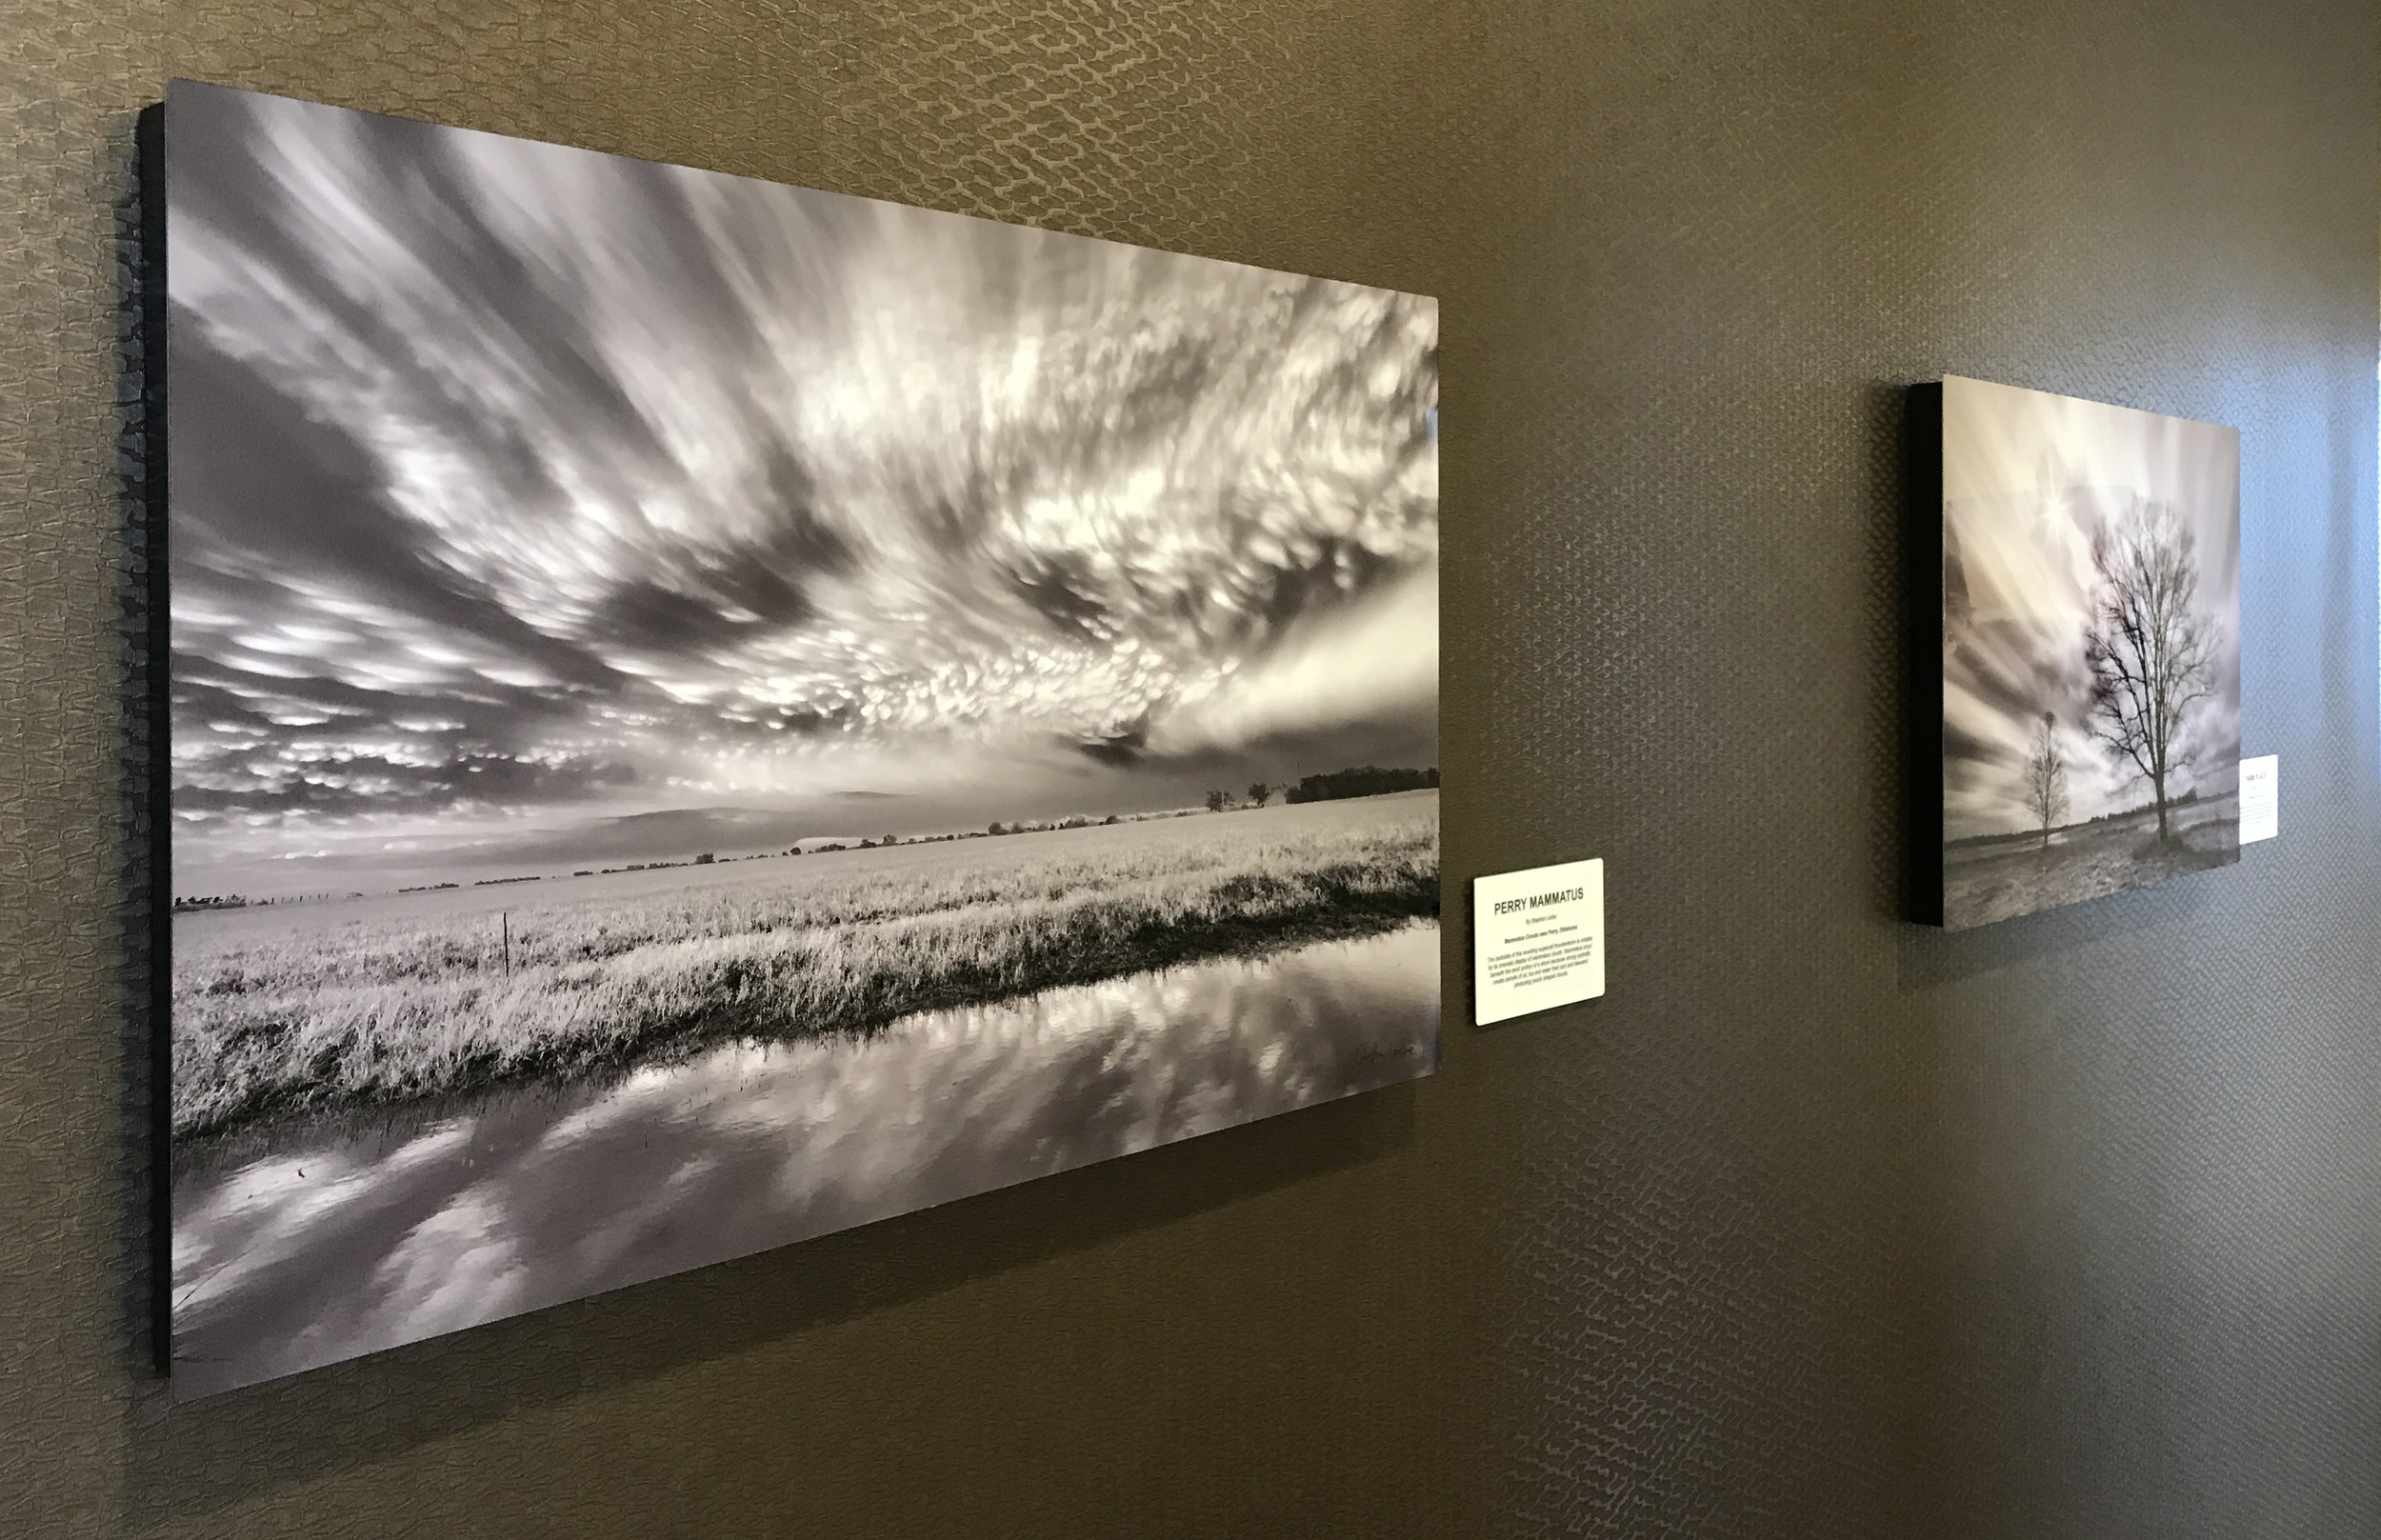 Perry Mammatus in situ at KCB 20 x 30 on metal